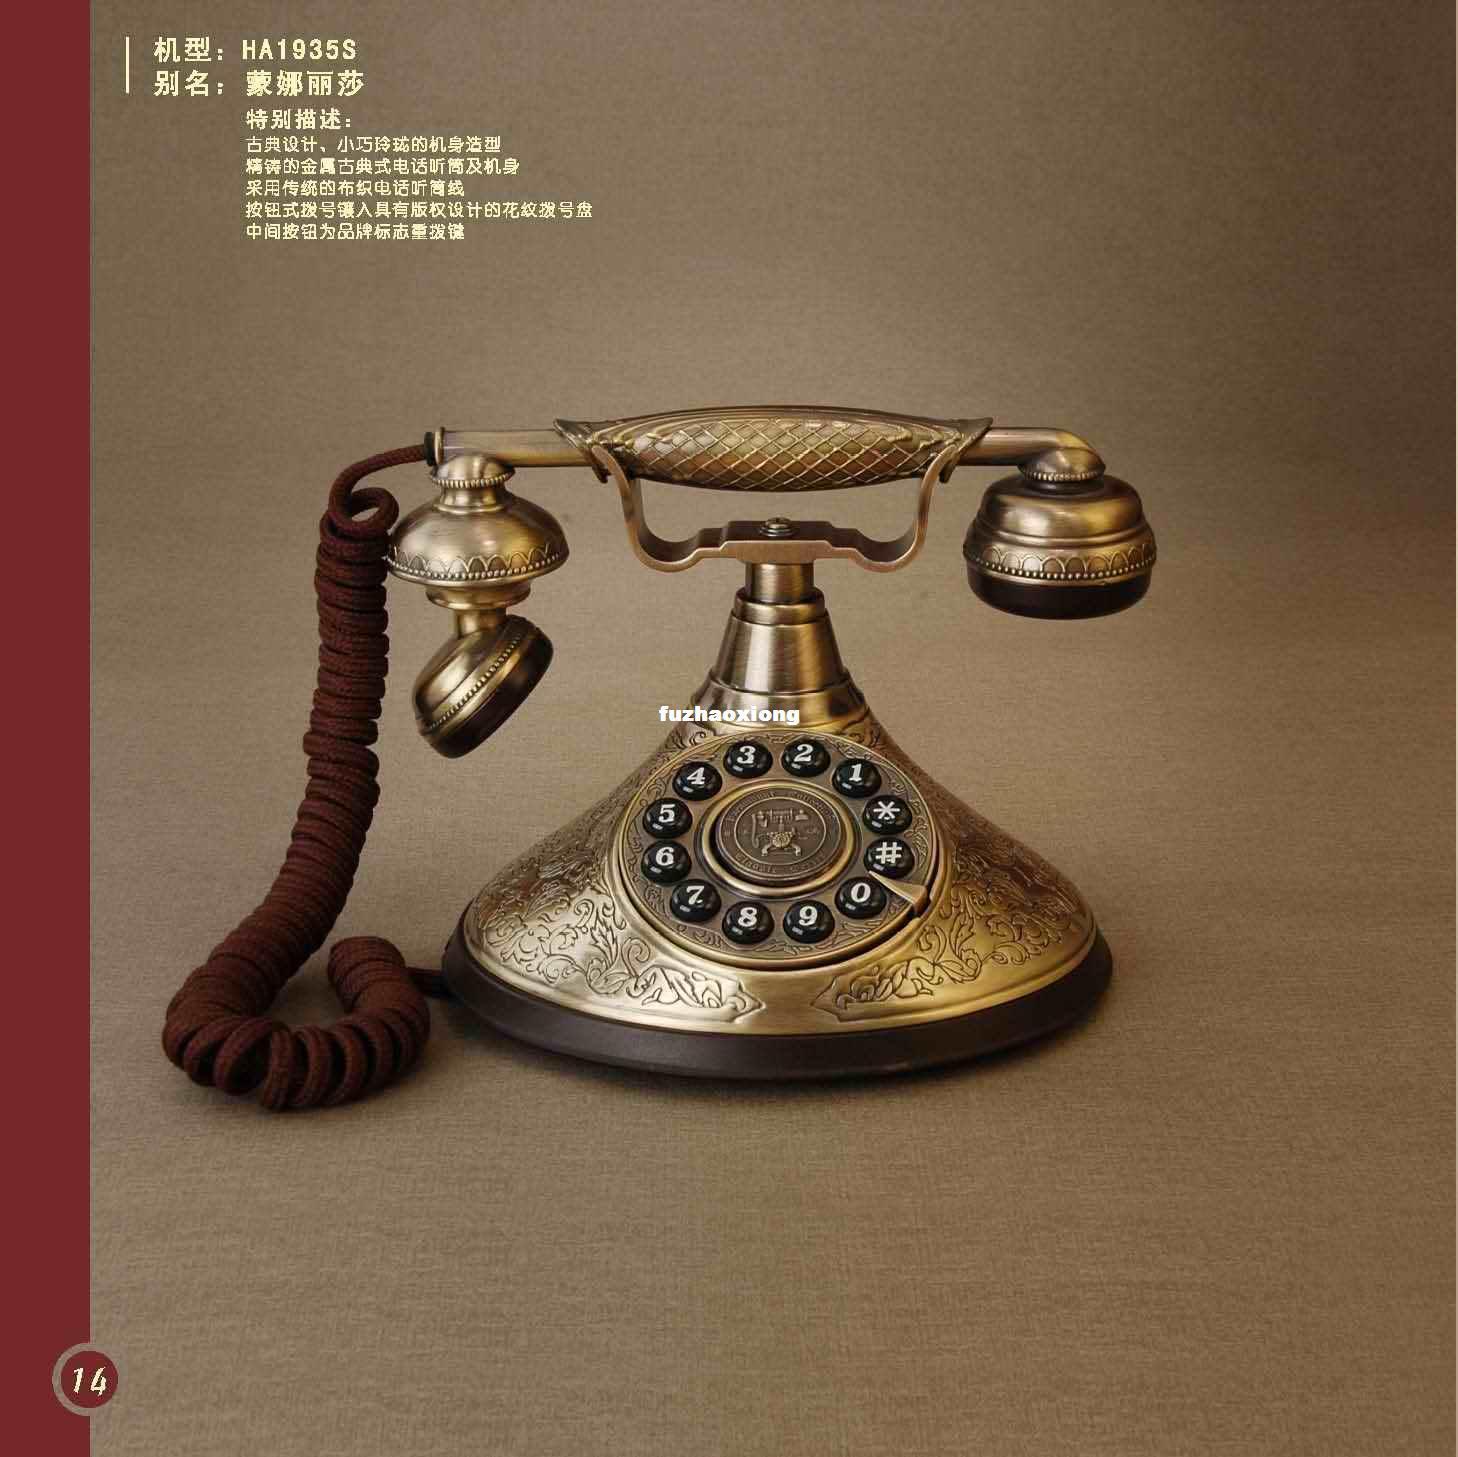 full metal antique telephone mona lisa 1935 classic telephone european home decor boutique gift. Black Bedroom Furniture Sets. Home Design Ideas